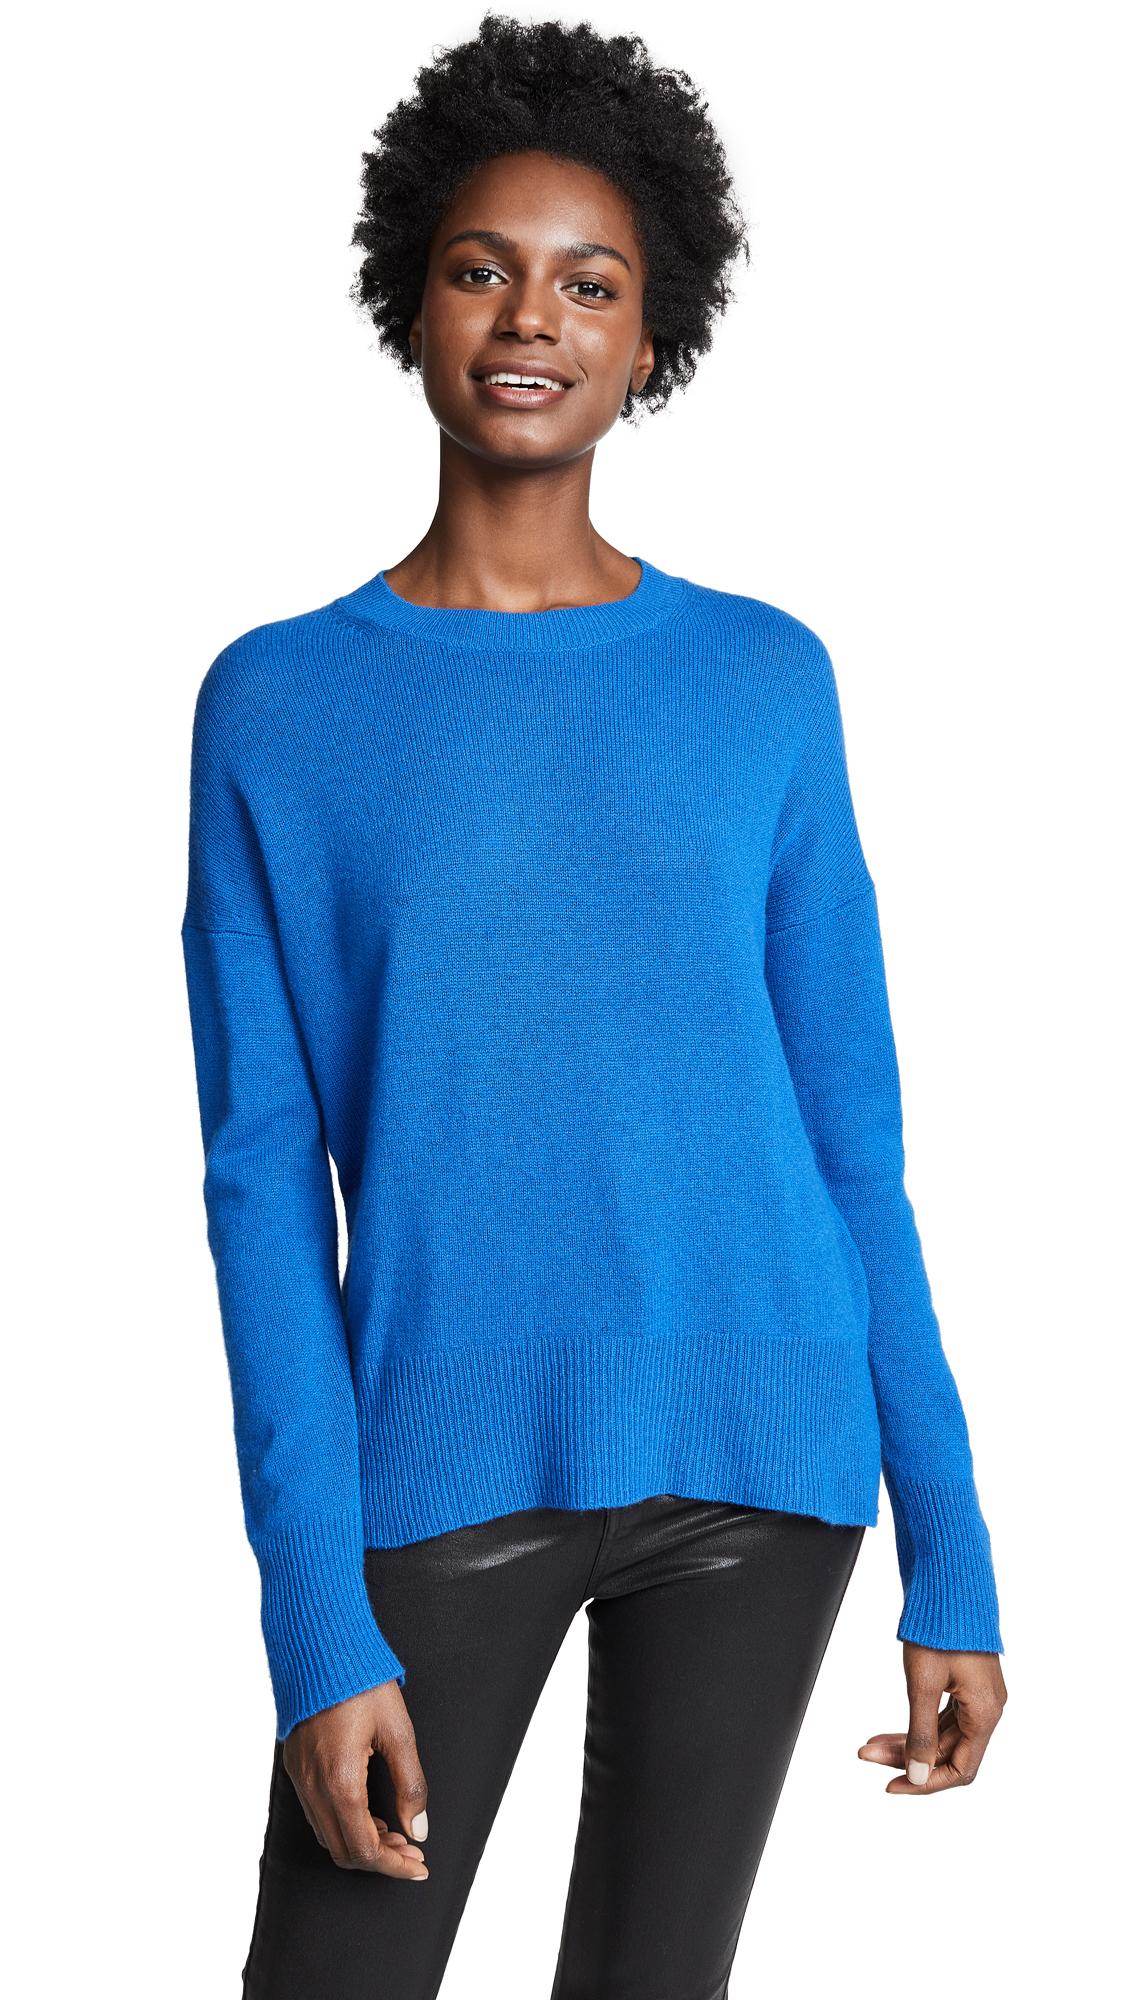 Theory Karenia Cashmere Sweater - Royal Blue